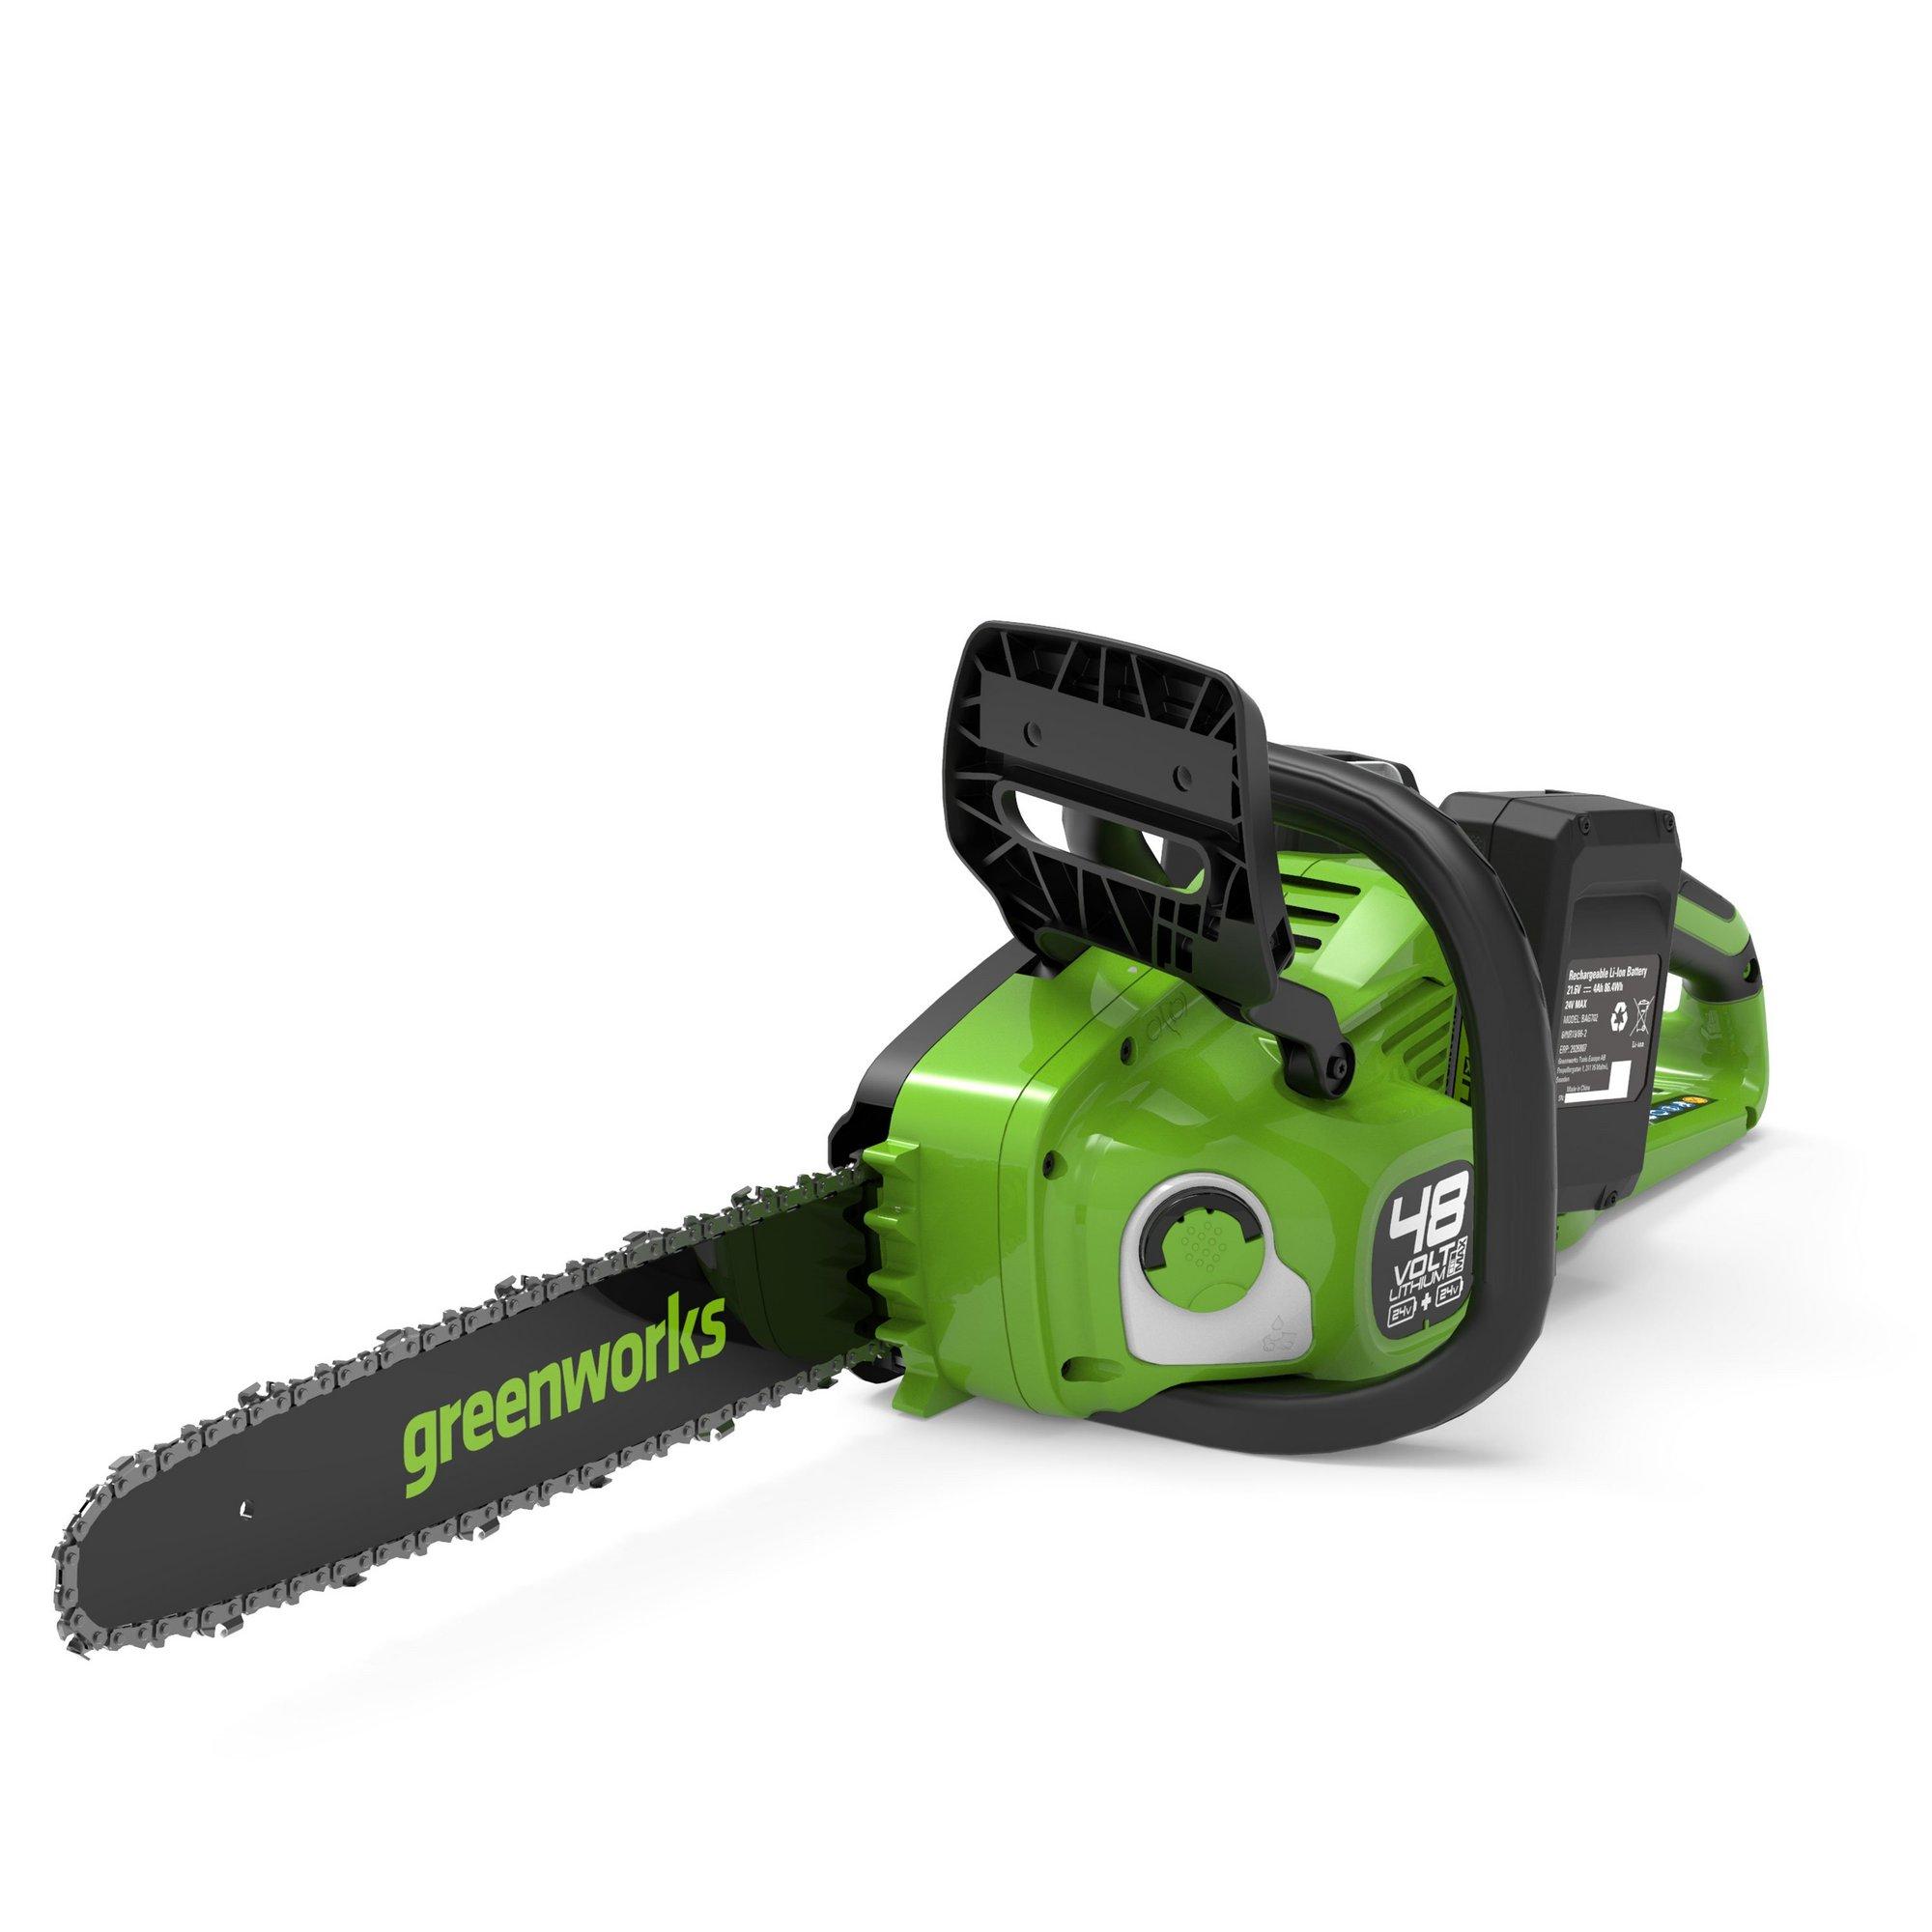 Image of Greenworks 48V Cordless 36cm Brushless Chainsaw with 2 x 24V 4ah ...